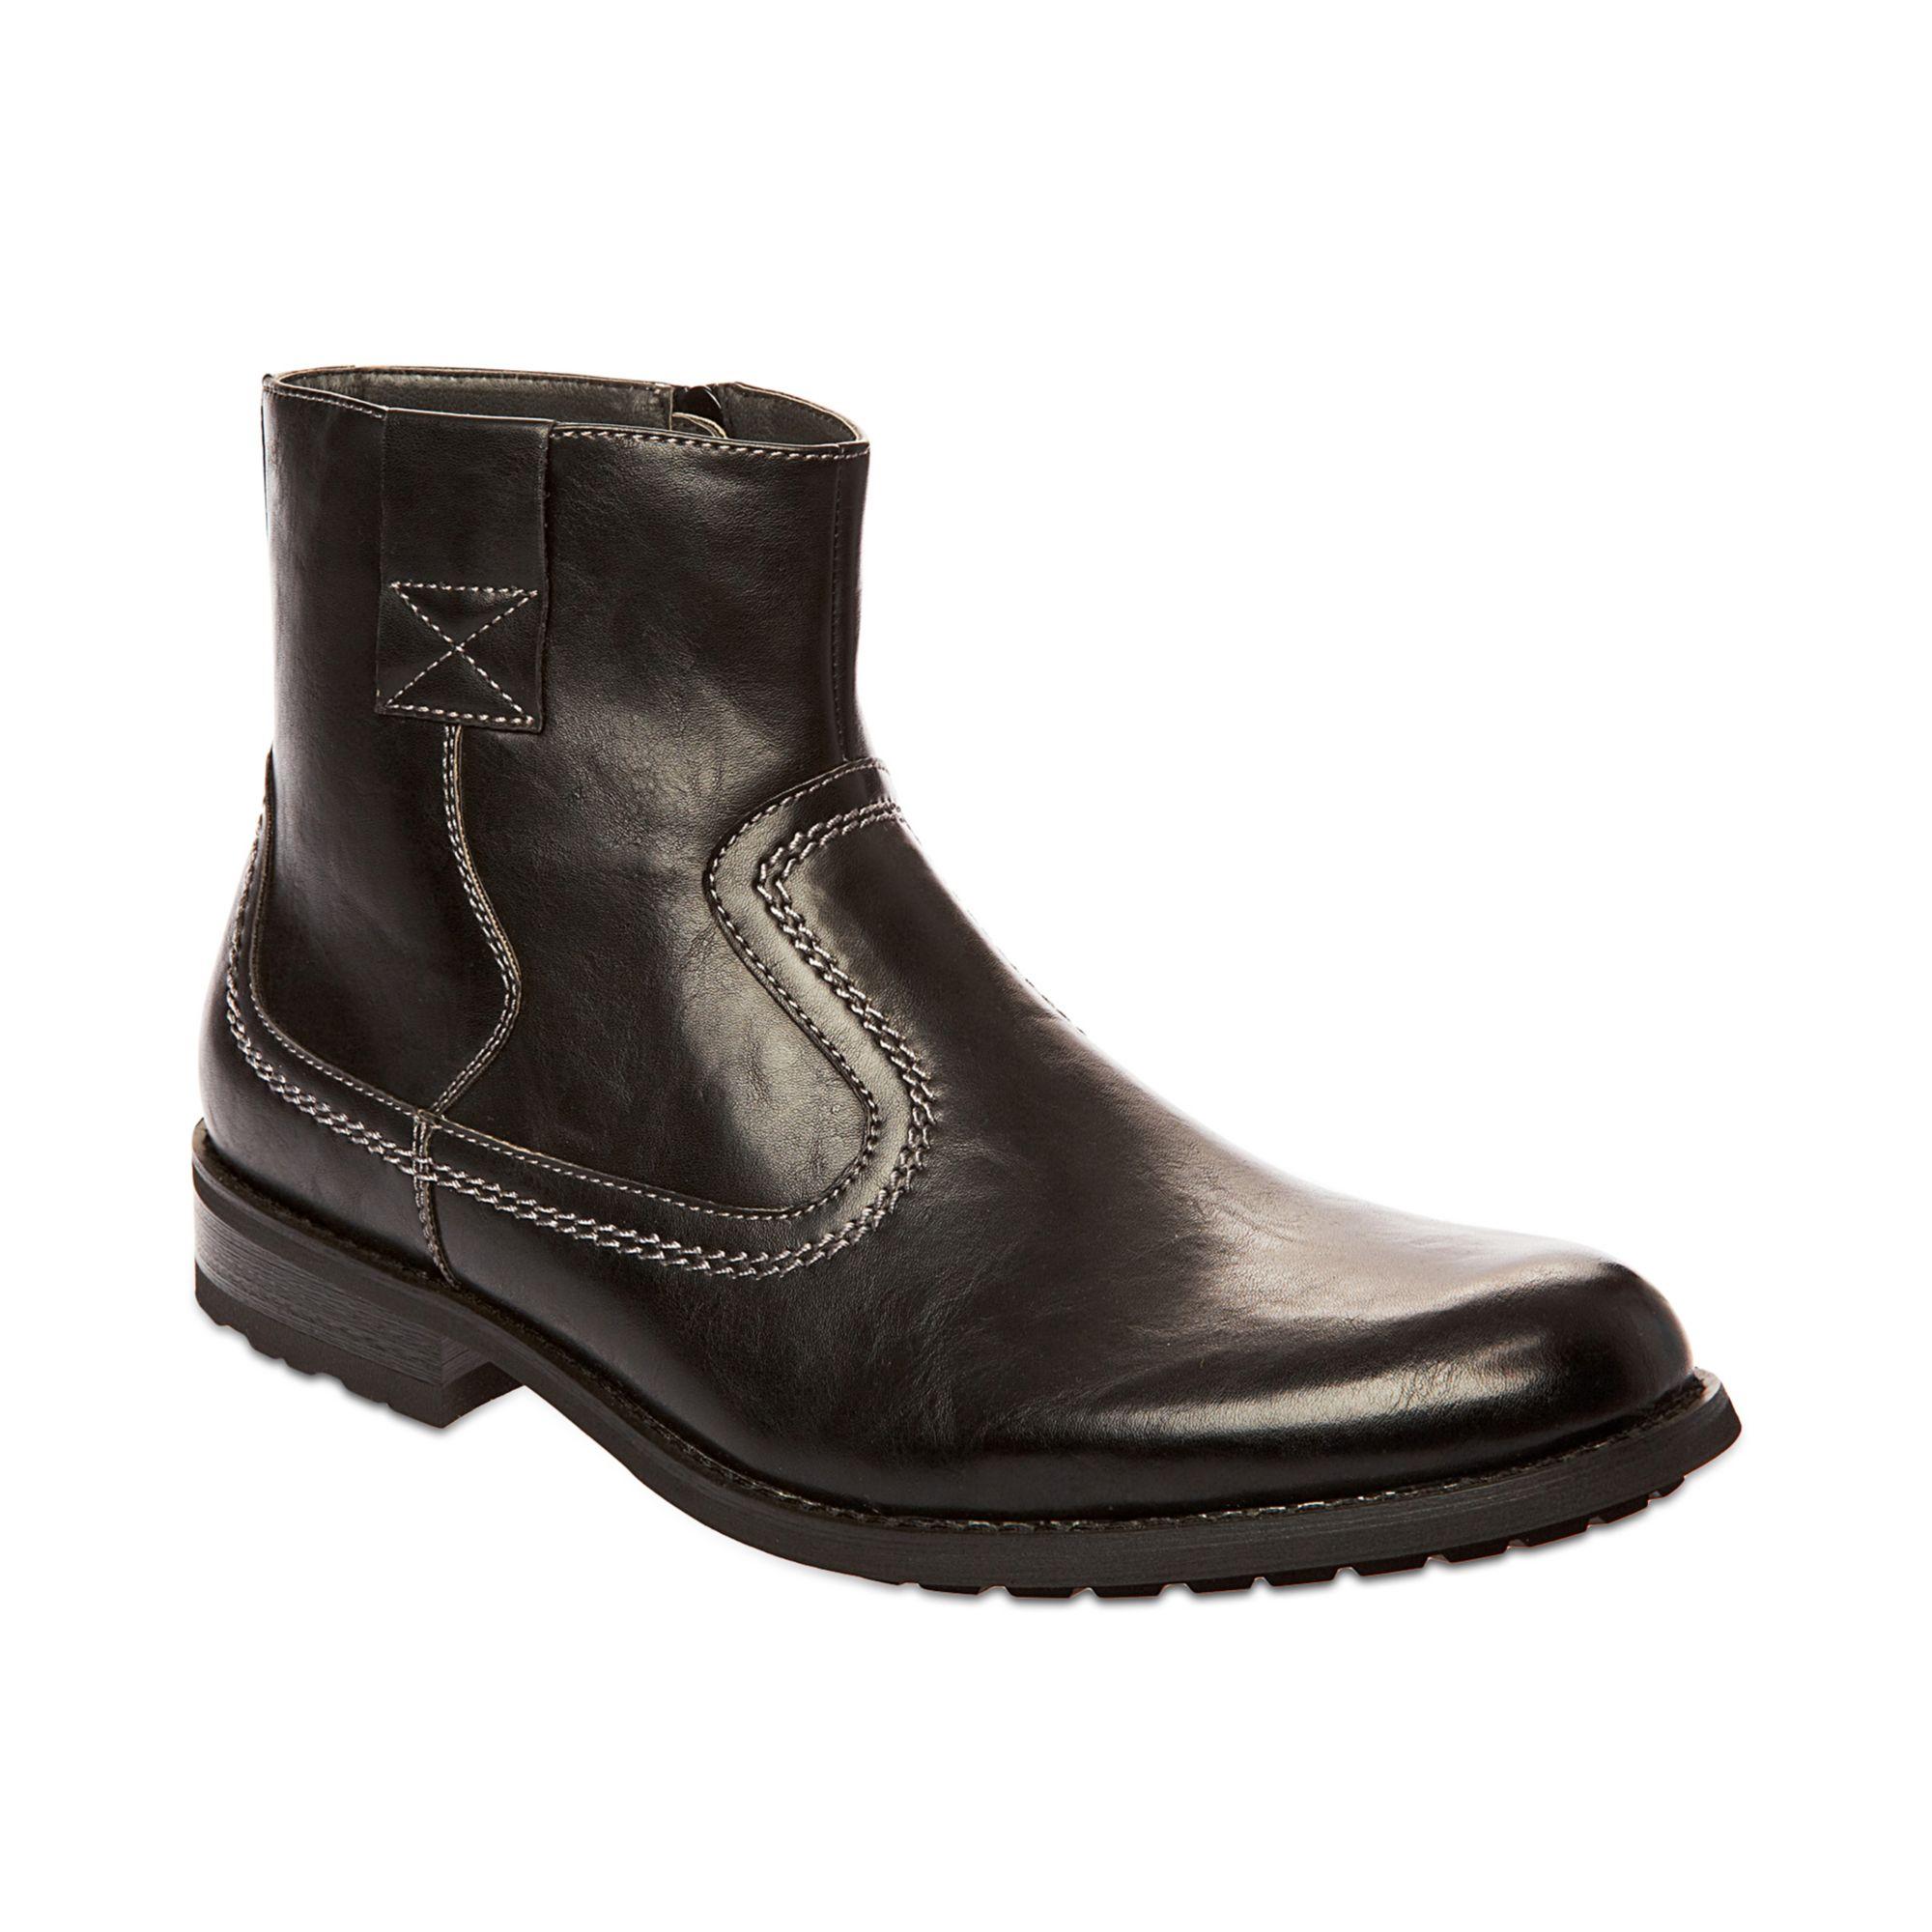 Steve Madden Madden Mens Shoes Solarr Boots in Black for ...